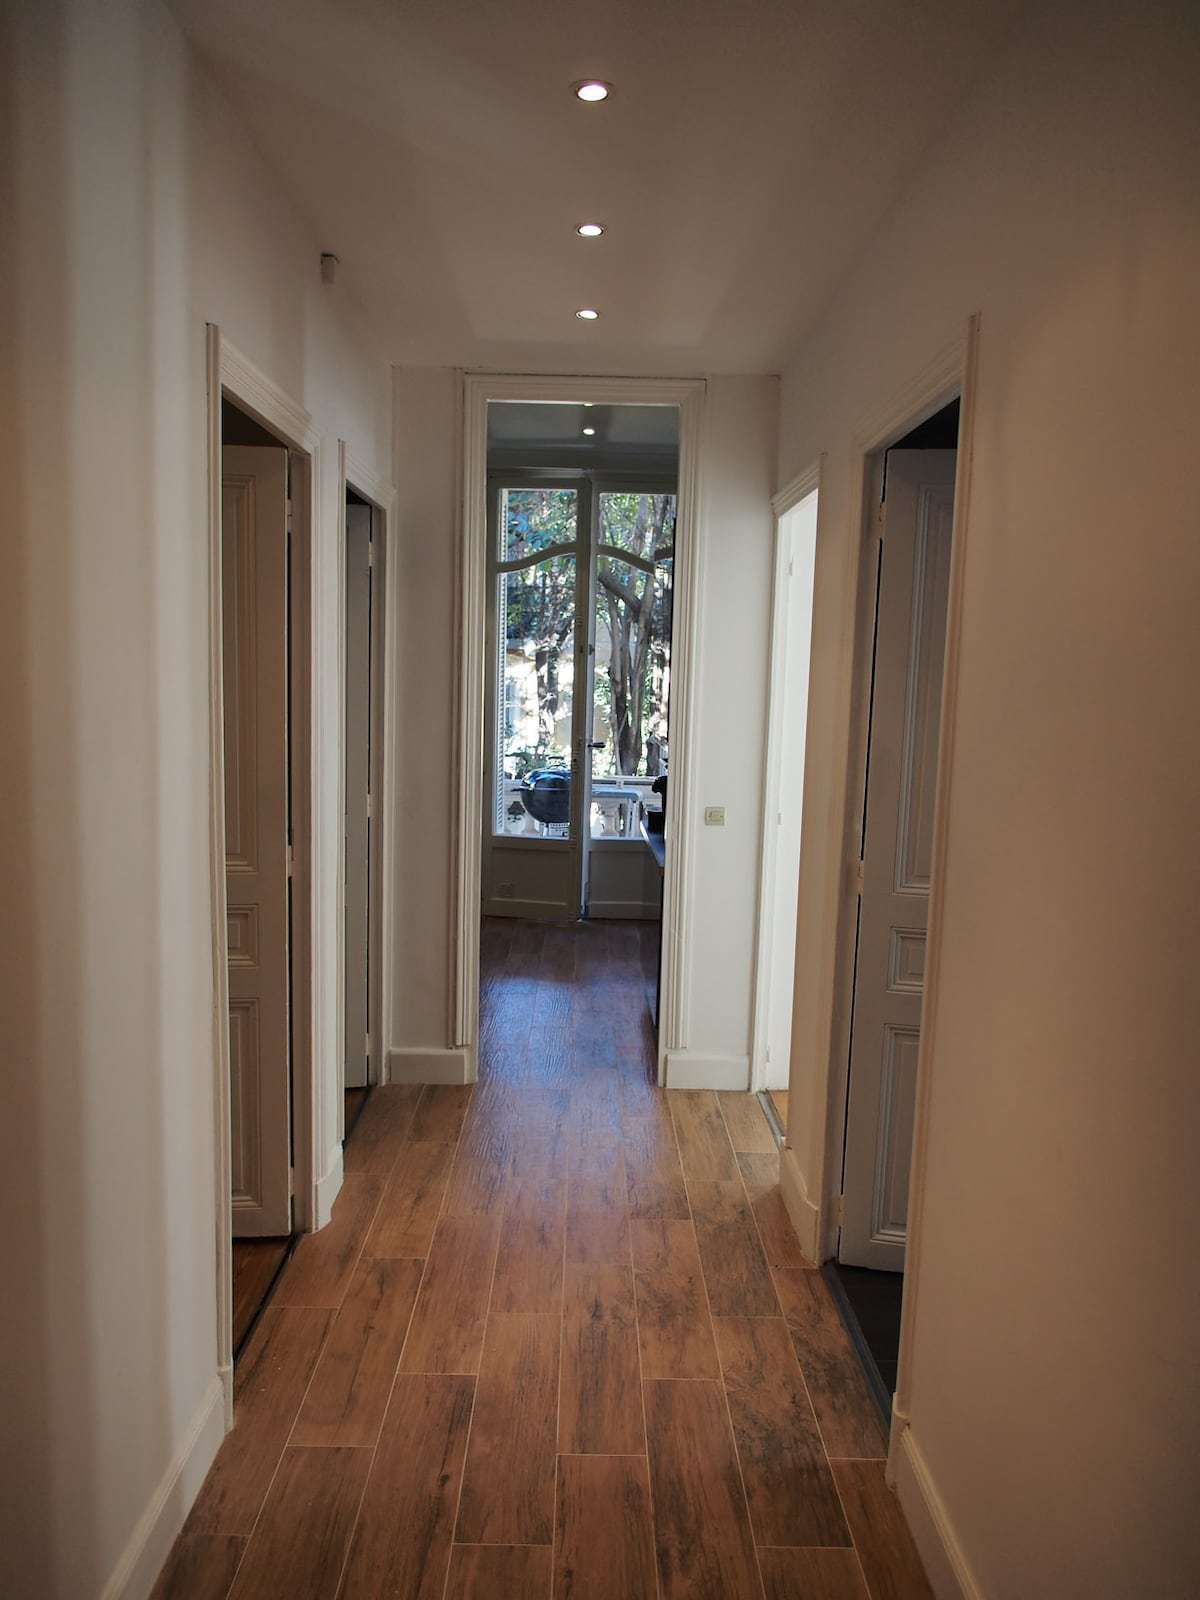 A gauche la premiere chambre SDB et la seconde chambre - A droite la salle de bain et le salon